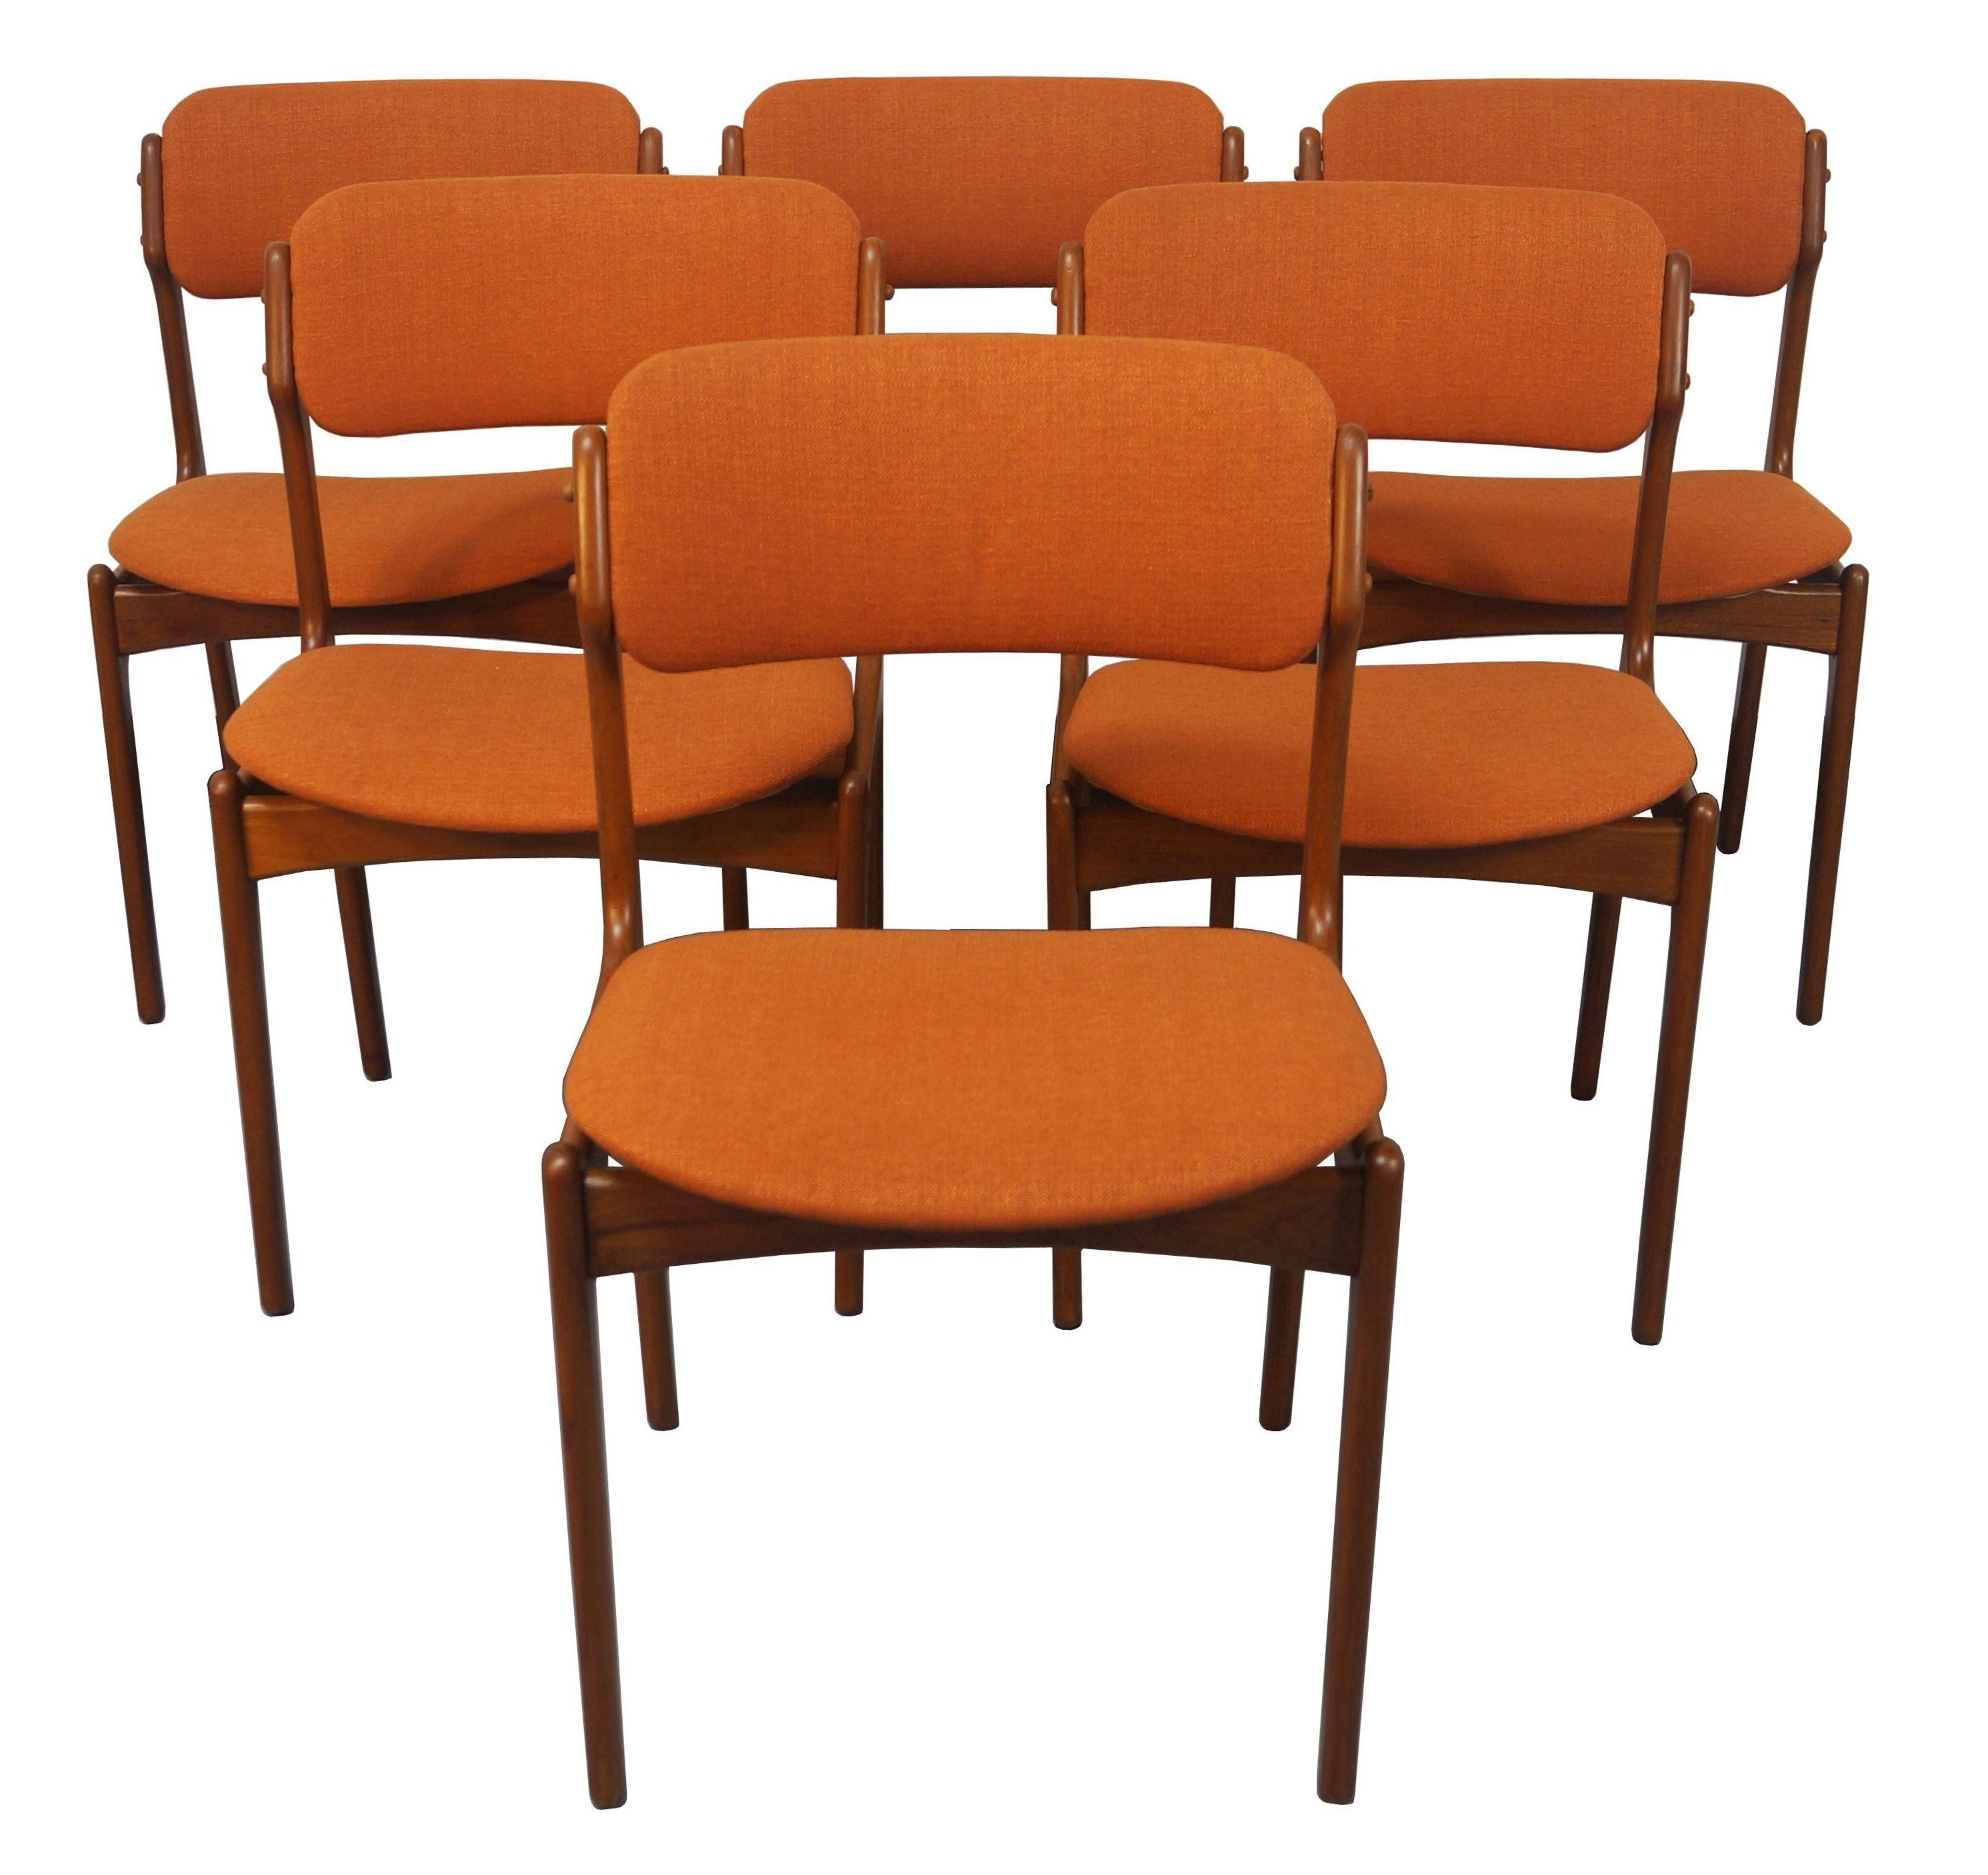 erik buck chairs gold wedding buch danish modern teak dining 6 chairish